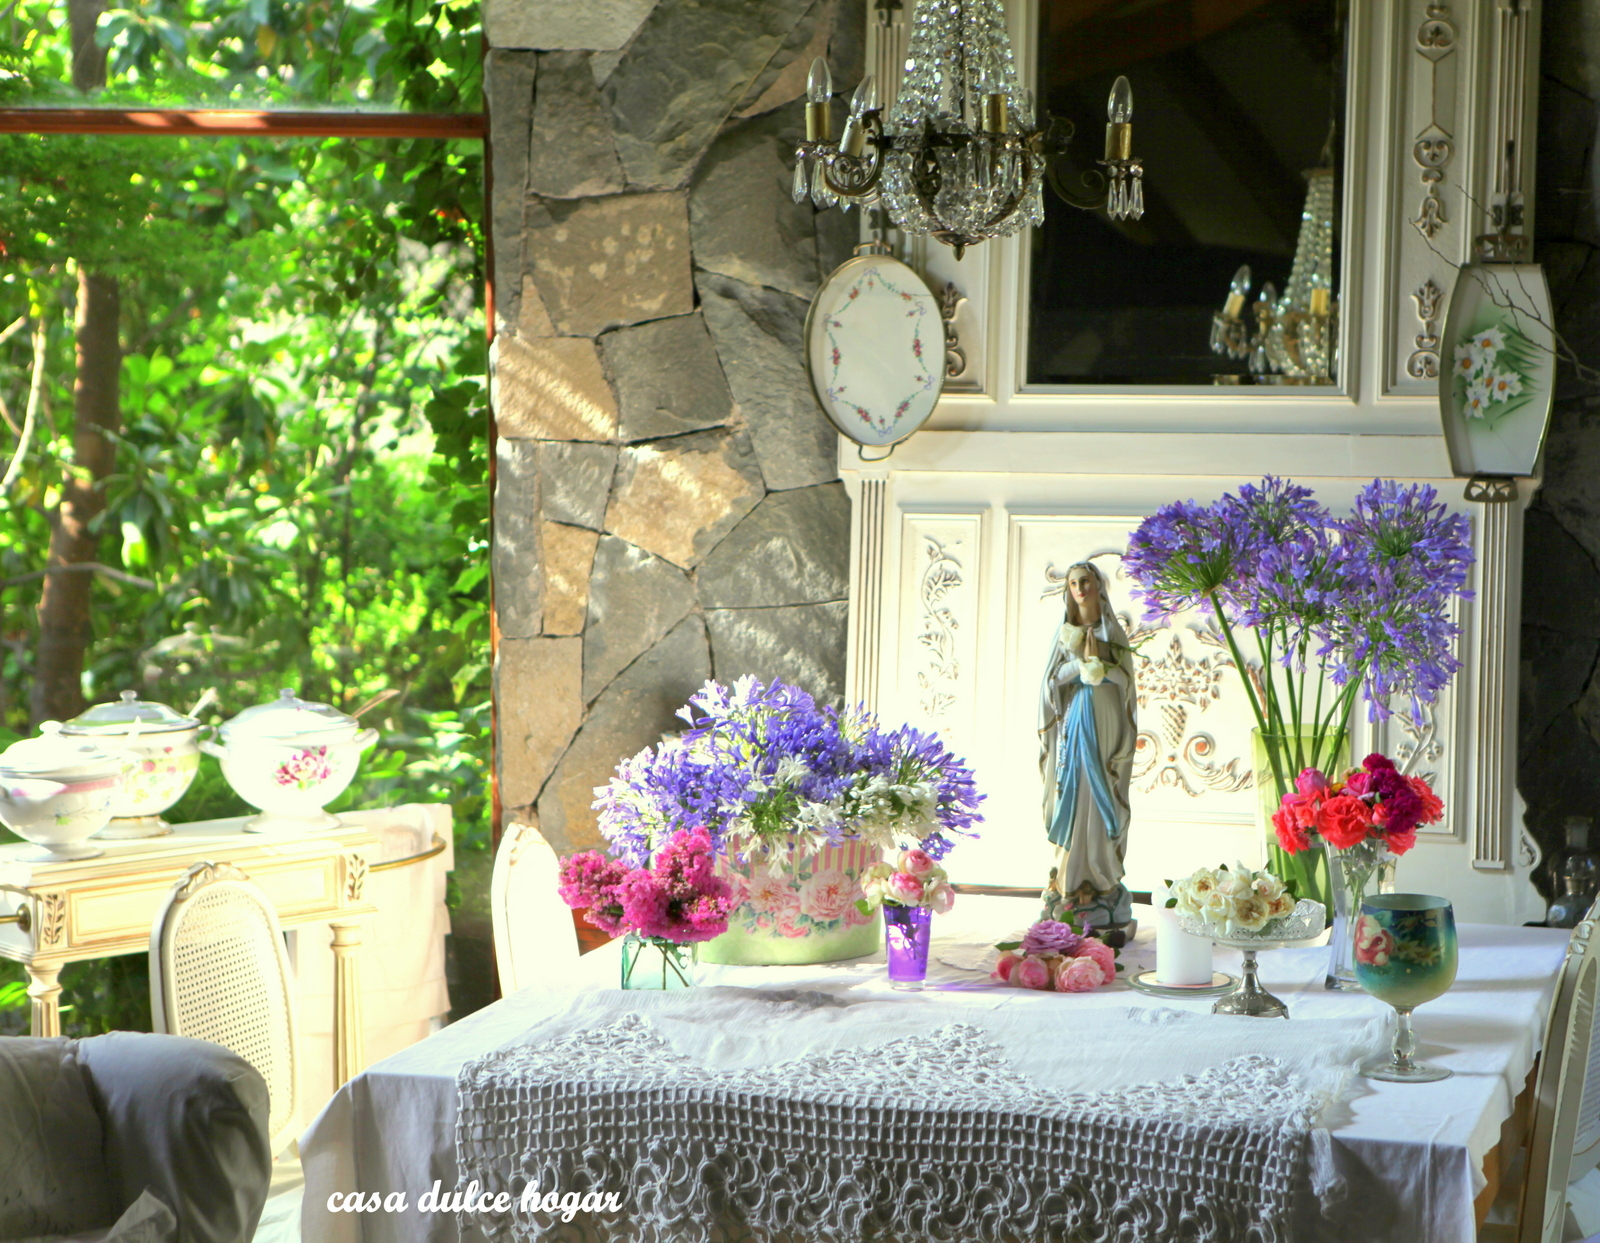 Casa dulce hogar flores de mi jard n en mi altar for Casa hogar jardin